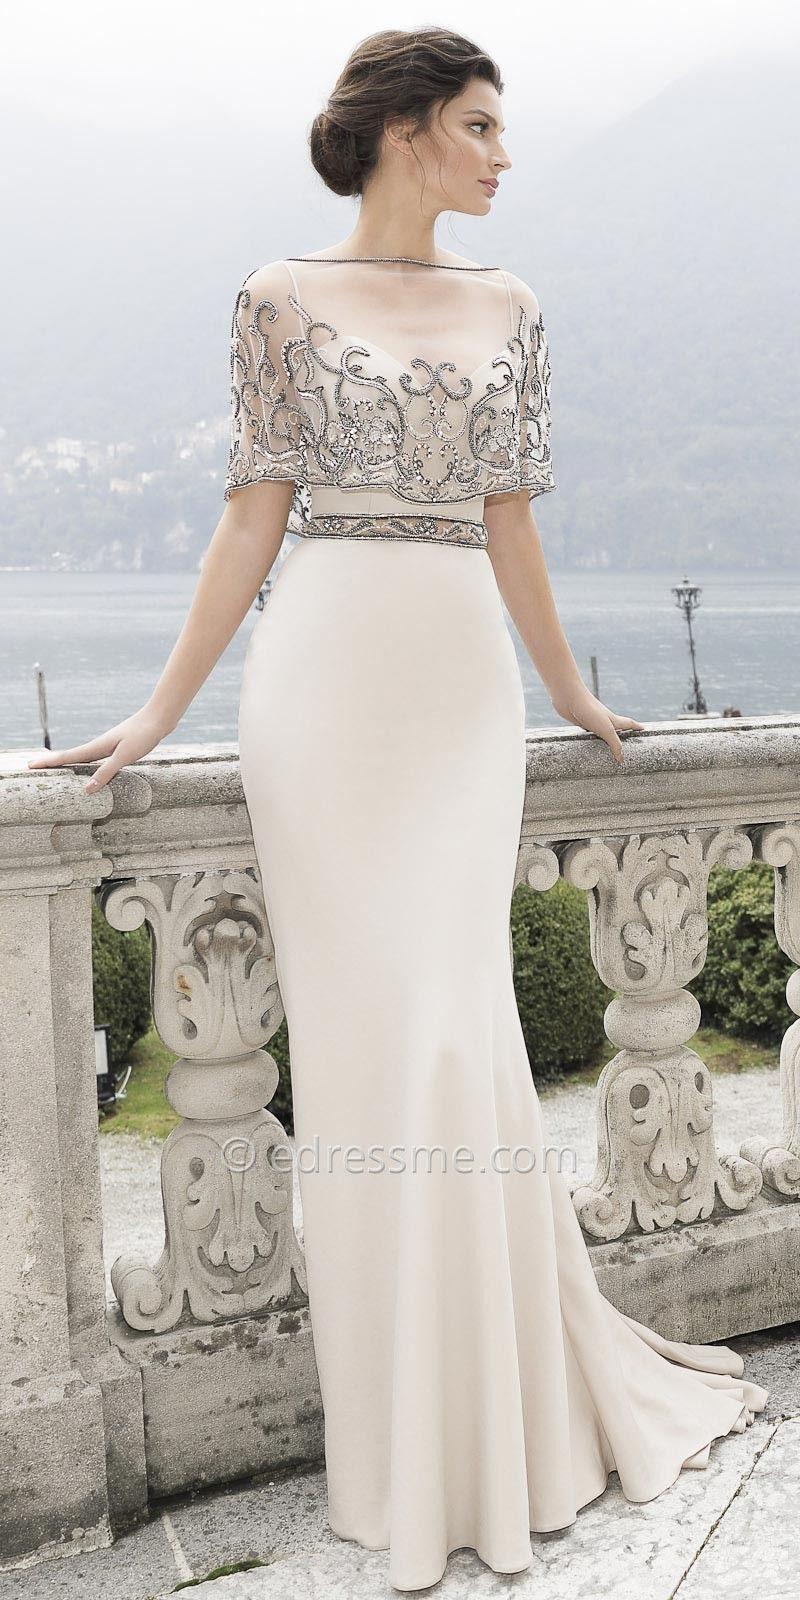 Ica Evening Dress By Tarik Ediz Evening Dresses Dresses Bride Dress [ 1600 x 800 Pixel ]